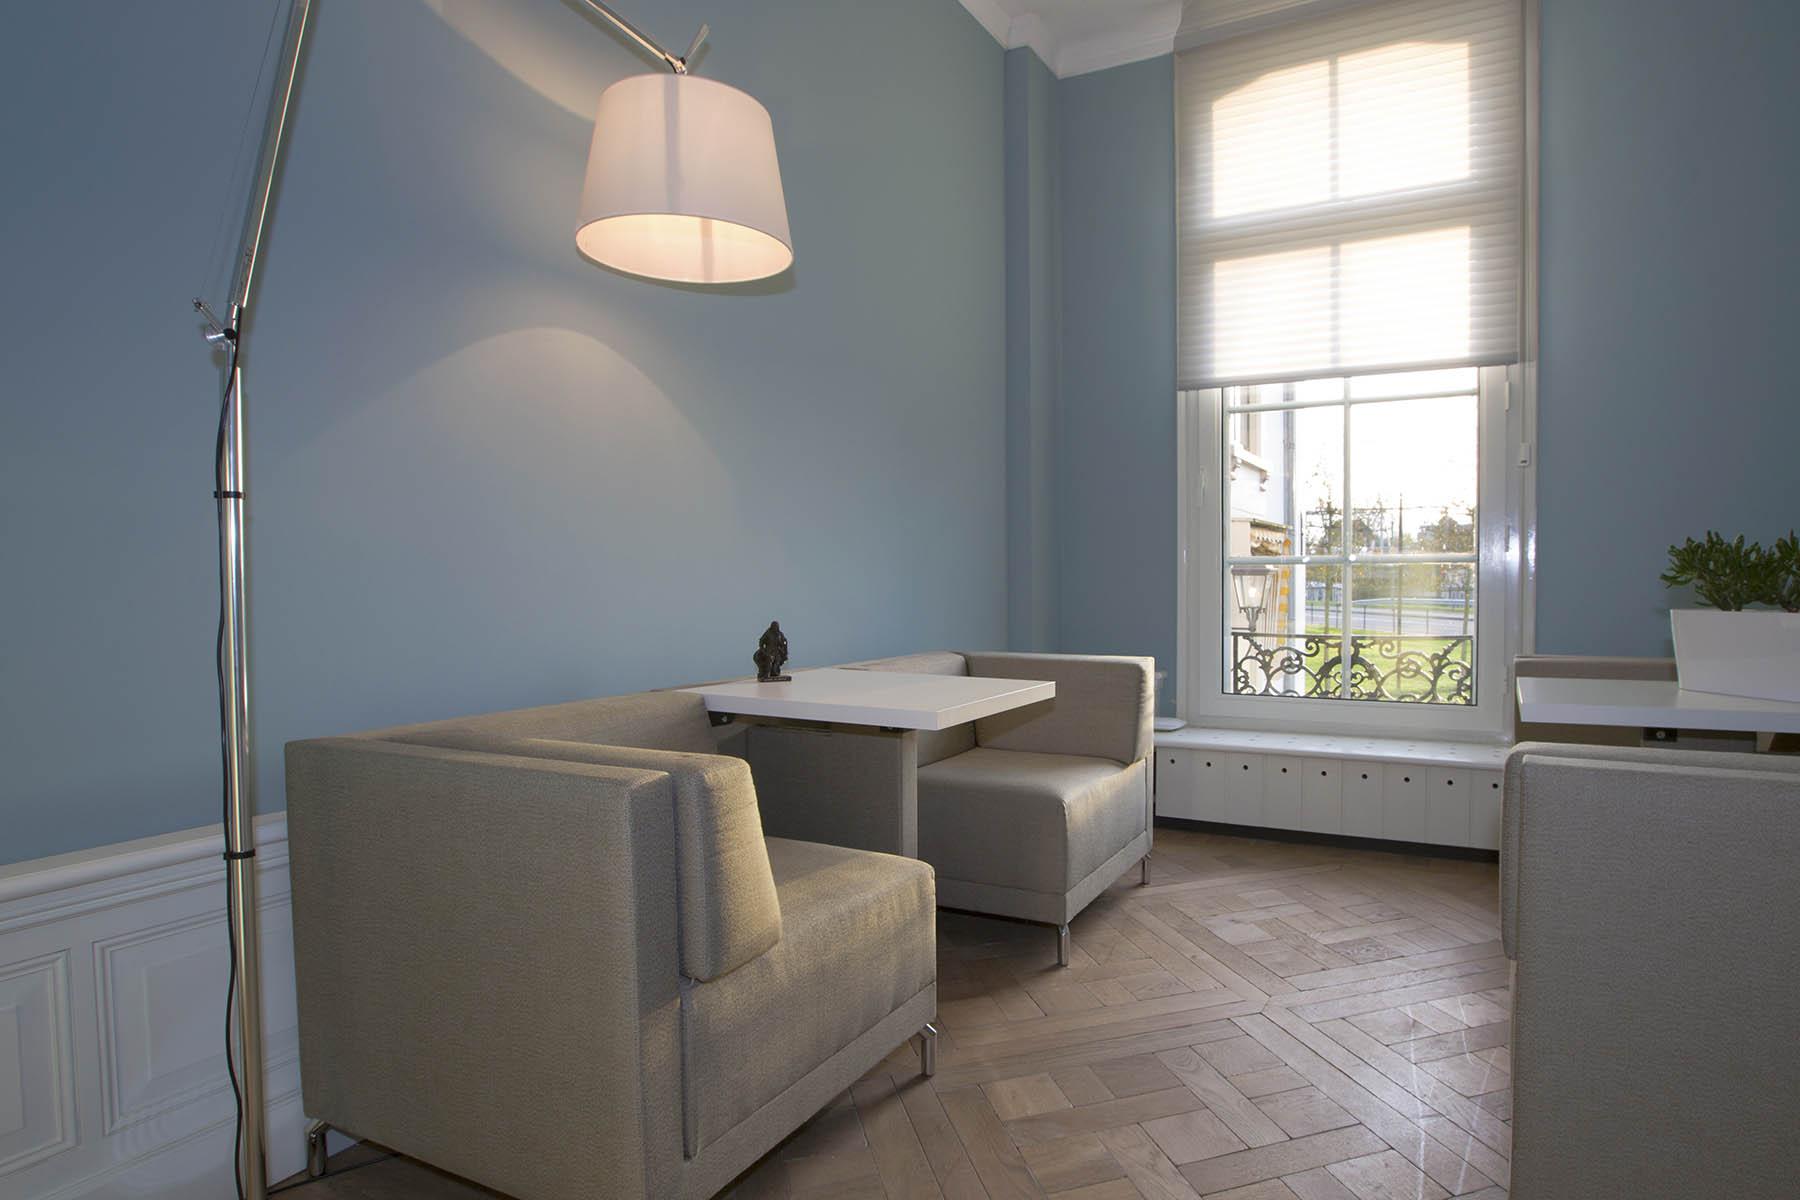 Oom-verzekeringen-interieurconcept-suzanne-holtz-studio-005-fotografie-Matthijs-Borghgraef